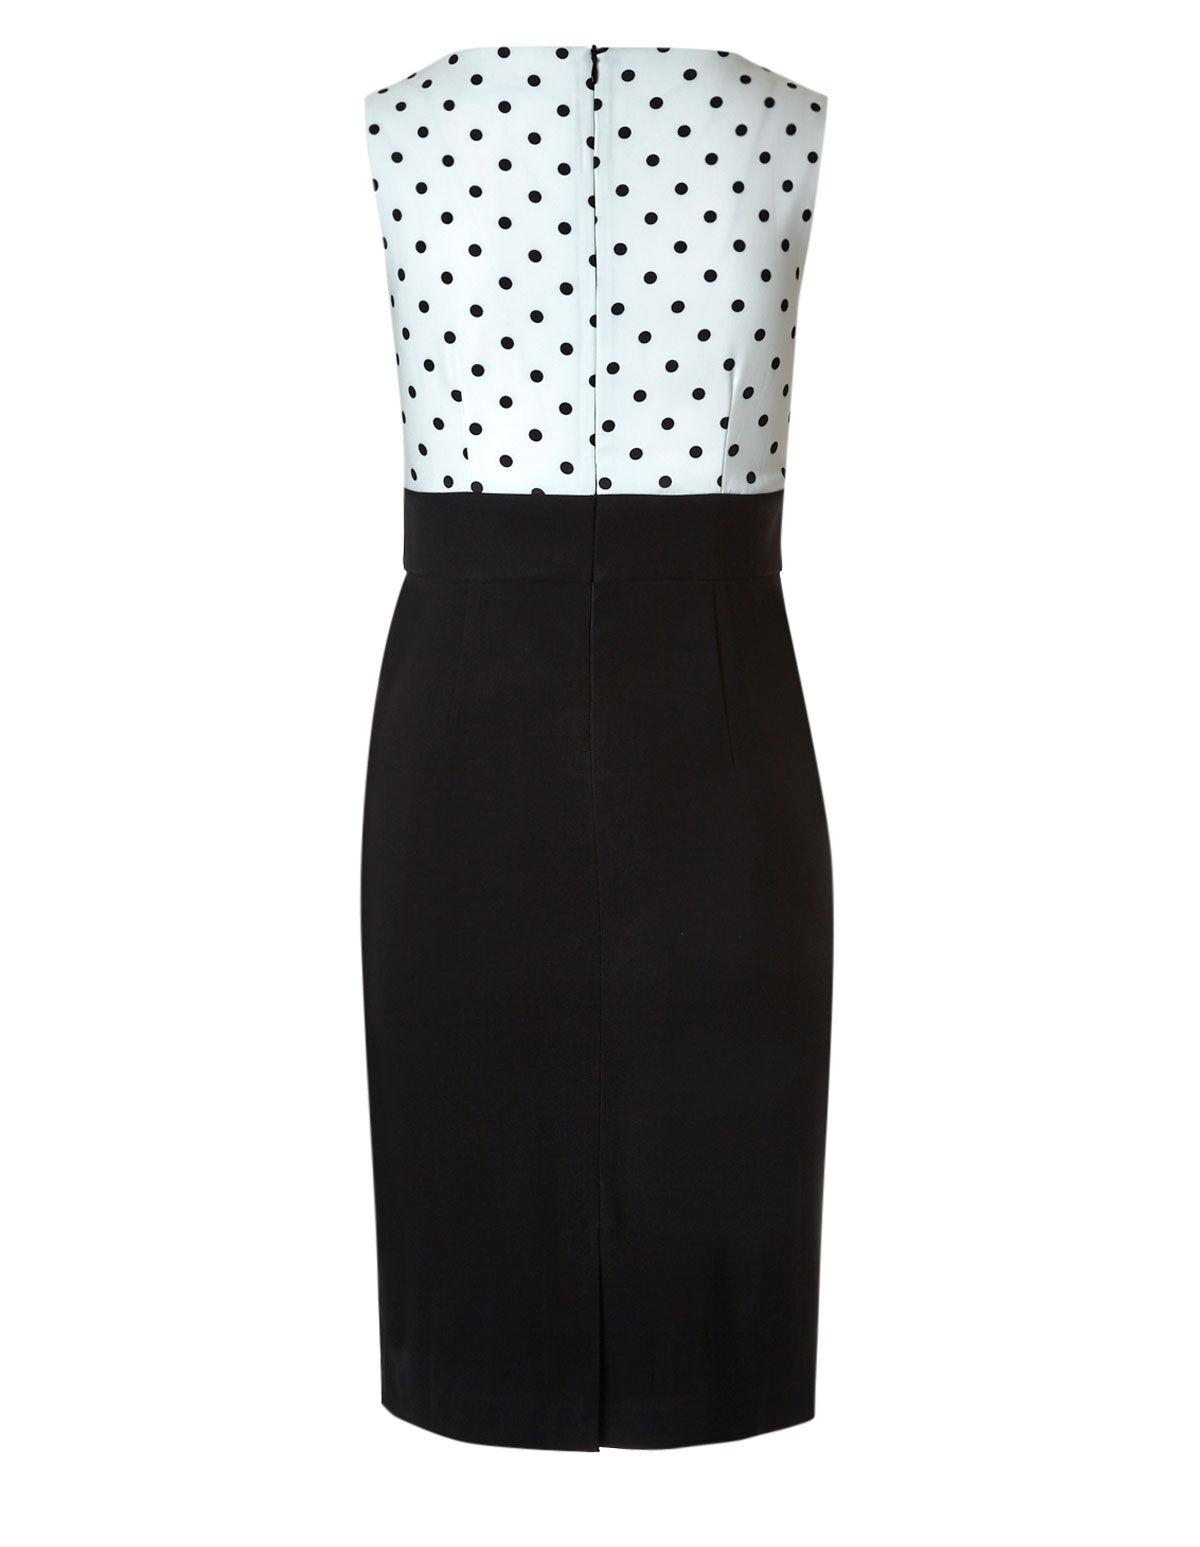 Black and White Store Dresses